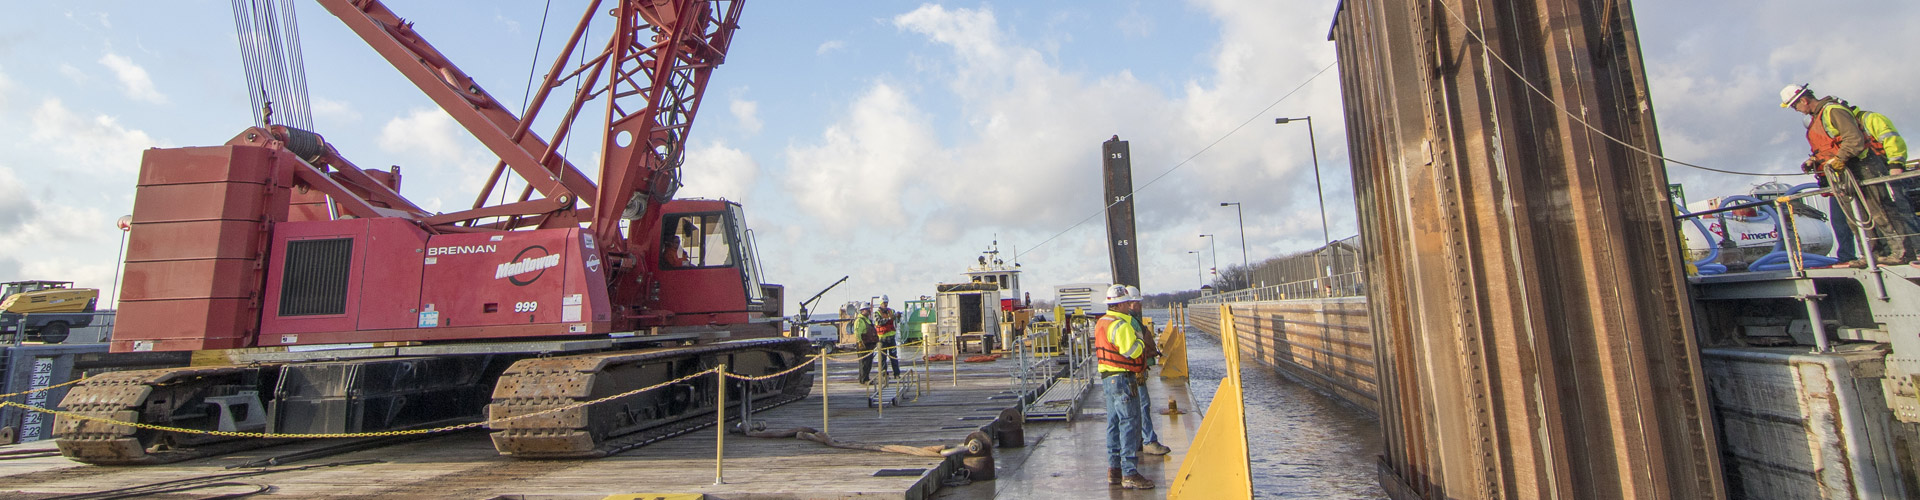 dam construction, cofferdams, lock and dams, mississippi river, construction, dam repairs, lock repairs, lock and dam contractor